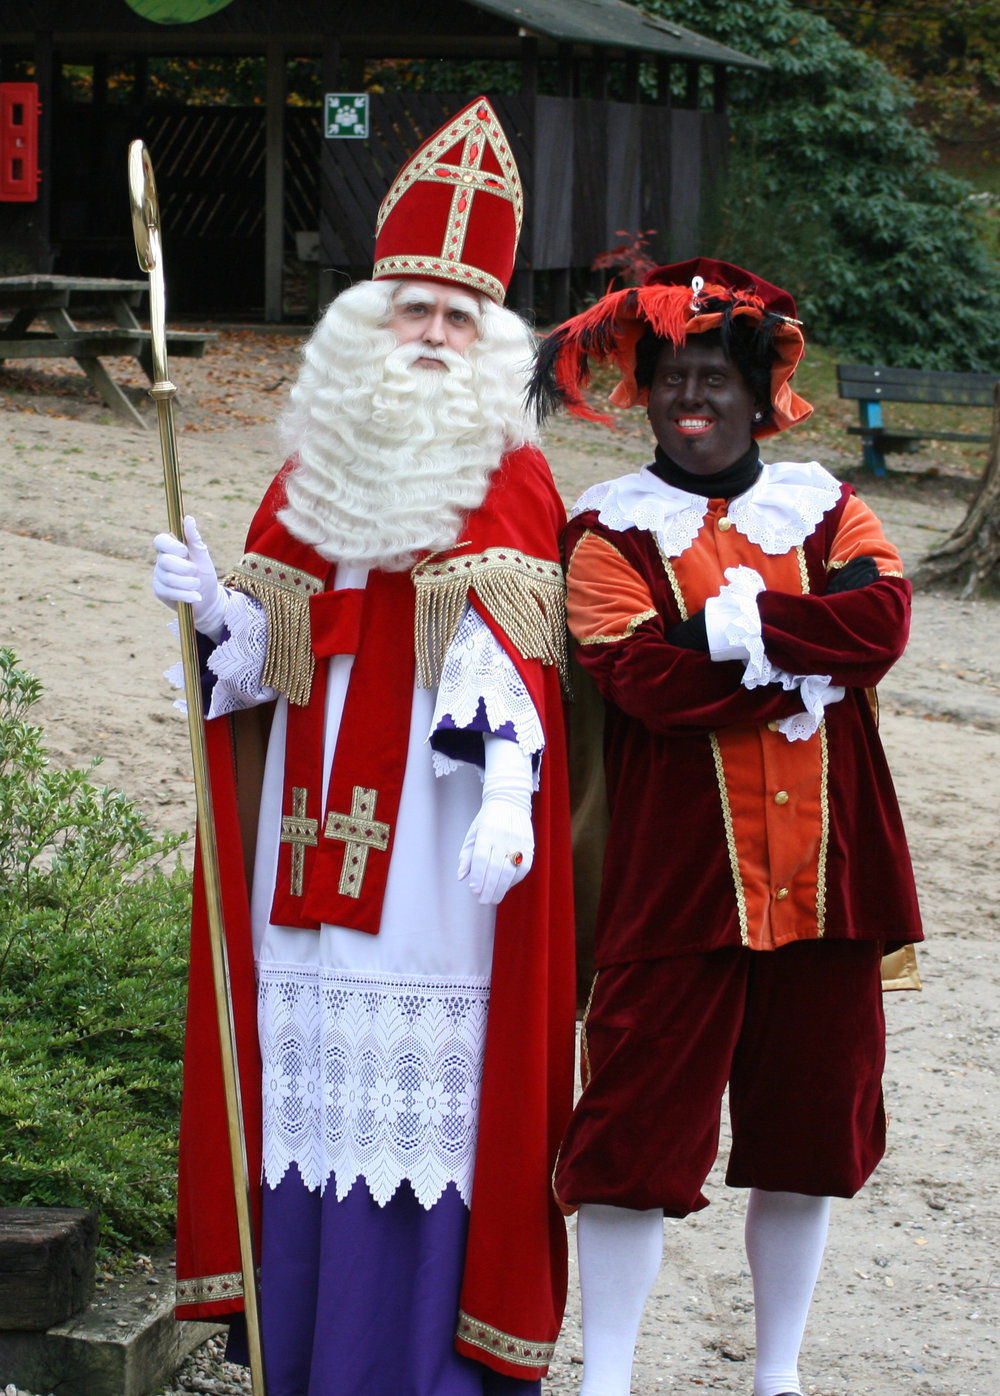 The Dutch version of Santa Claus has a helper named Zwarte Piet, or Black Peter